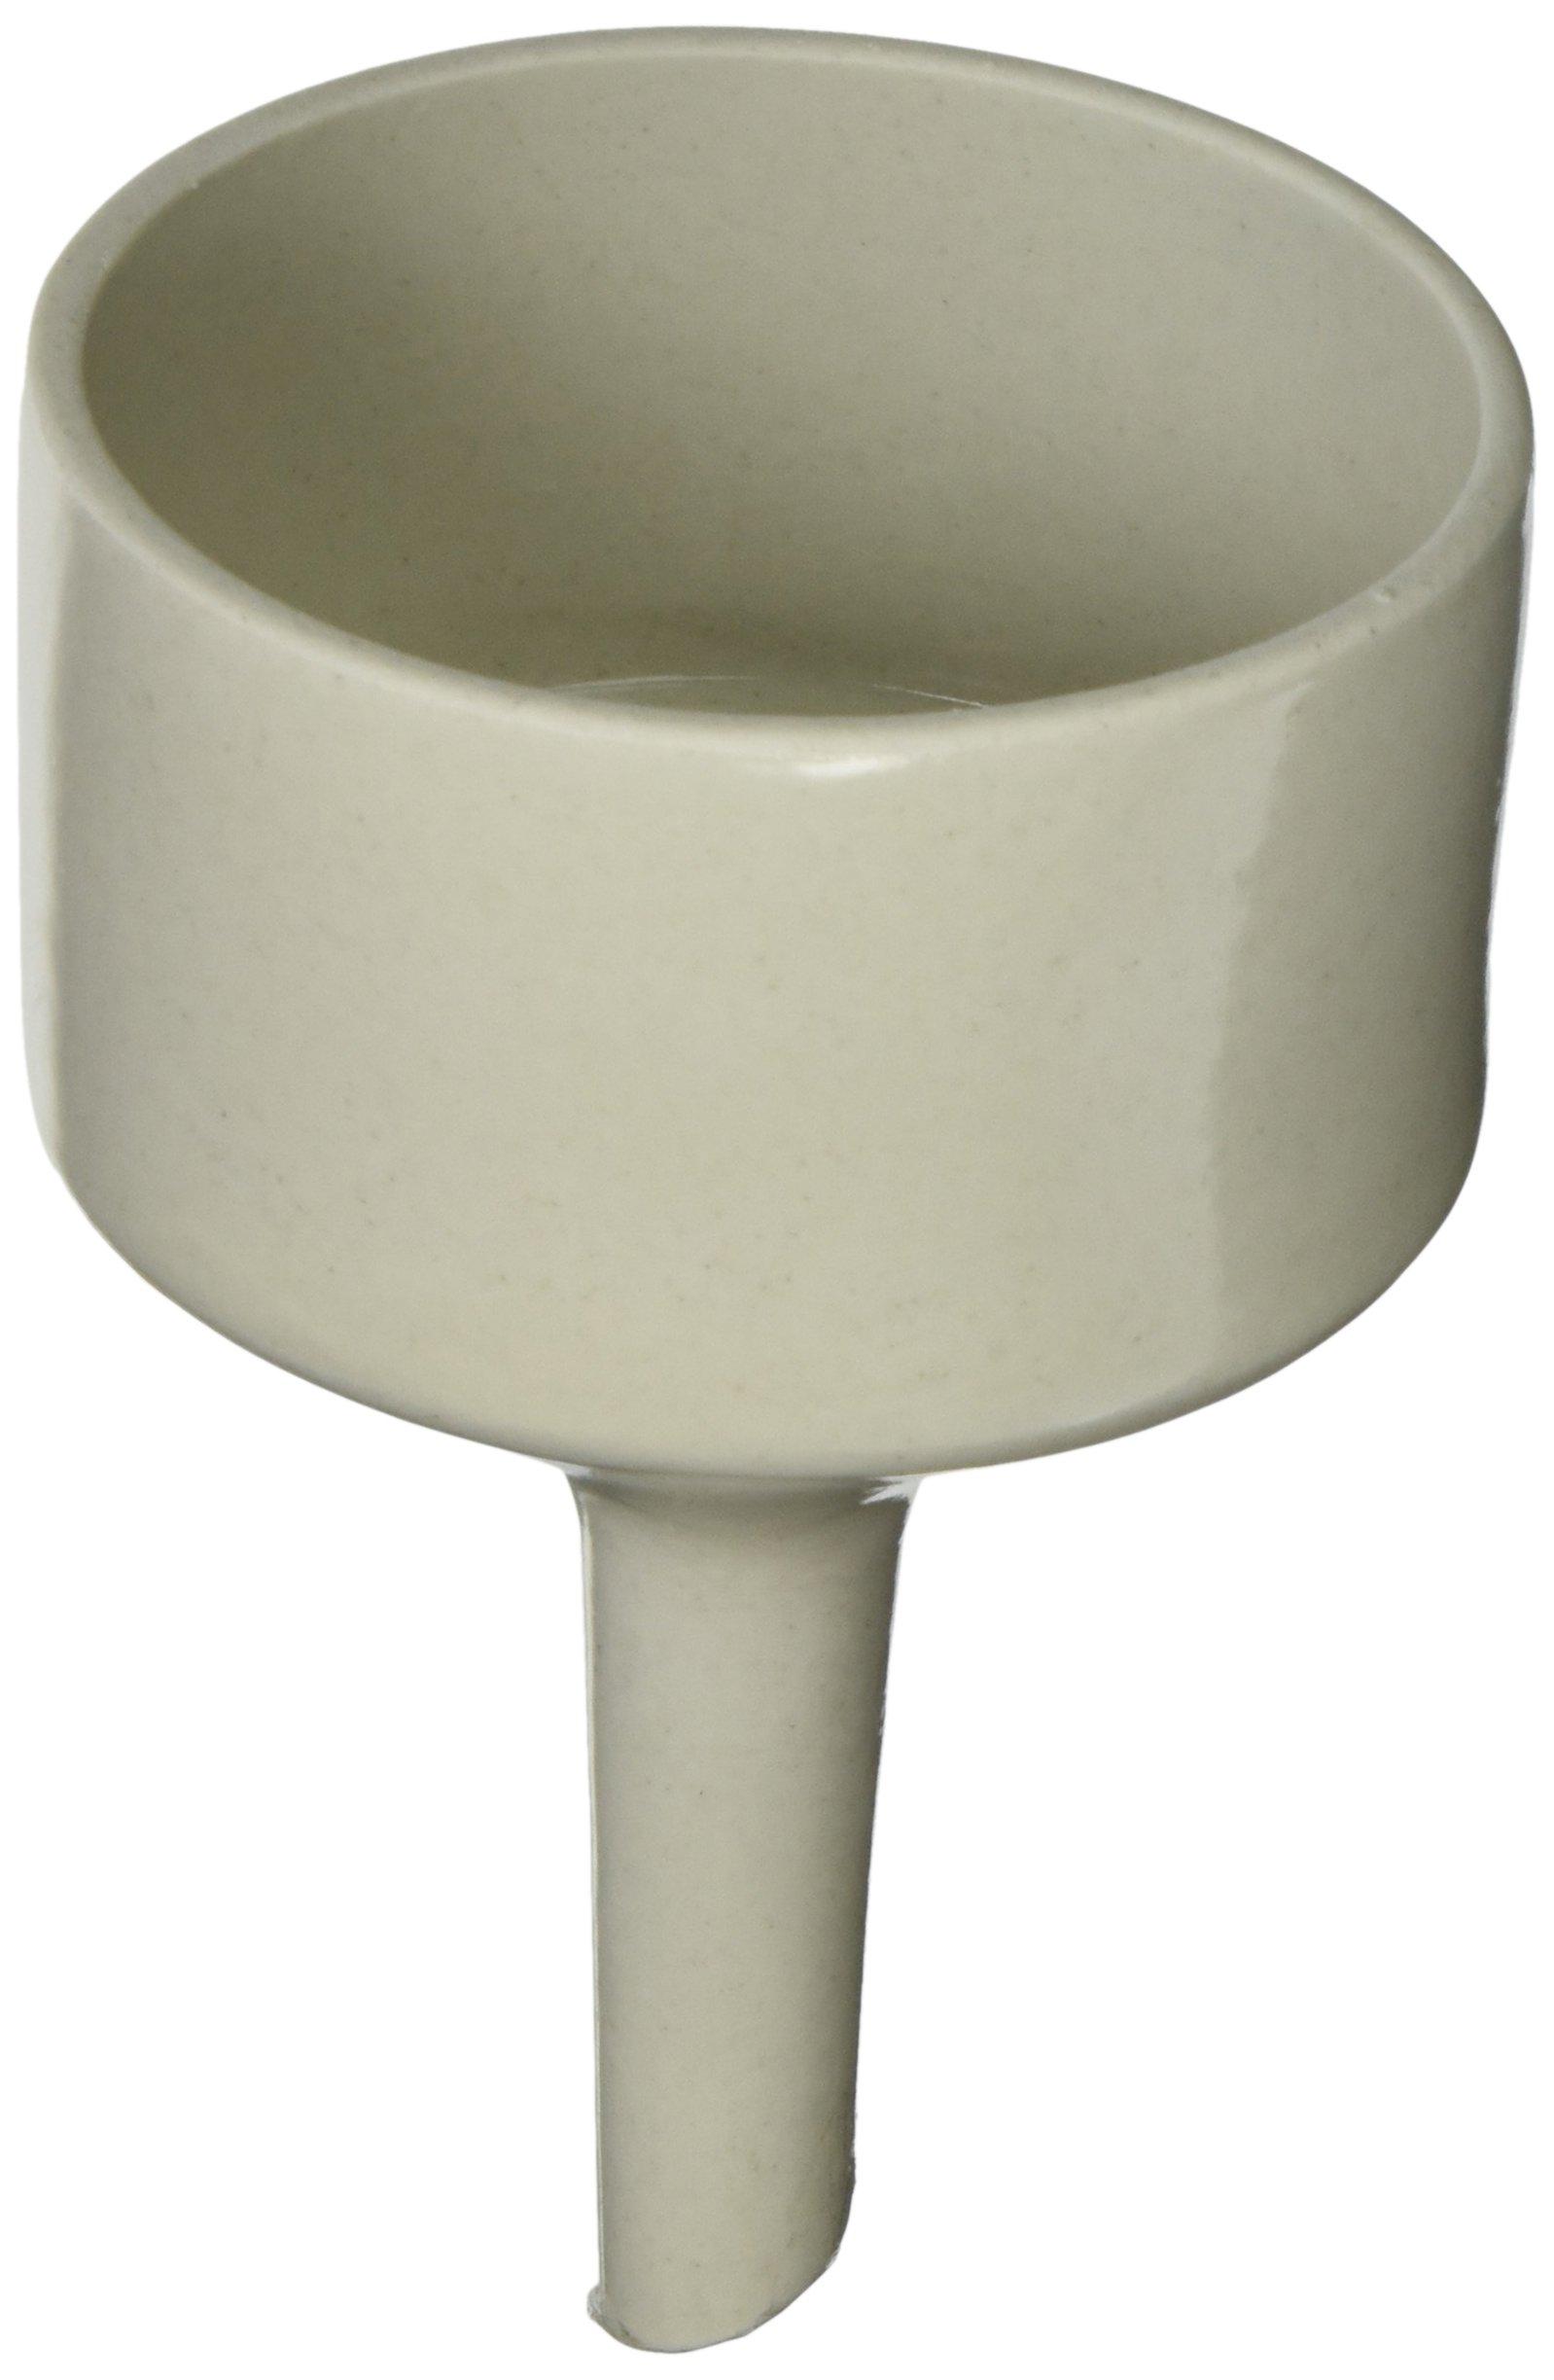 GSC International 4-6054 Porcelain Buchner Funnel, 100 mm x 30 mm